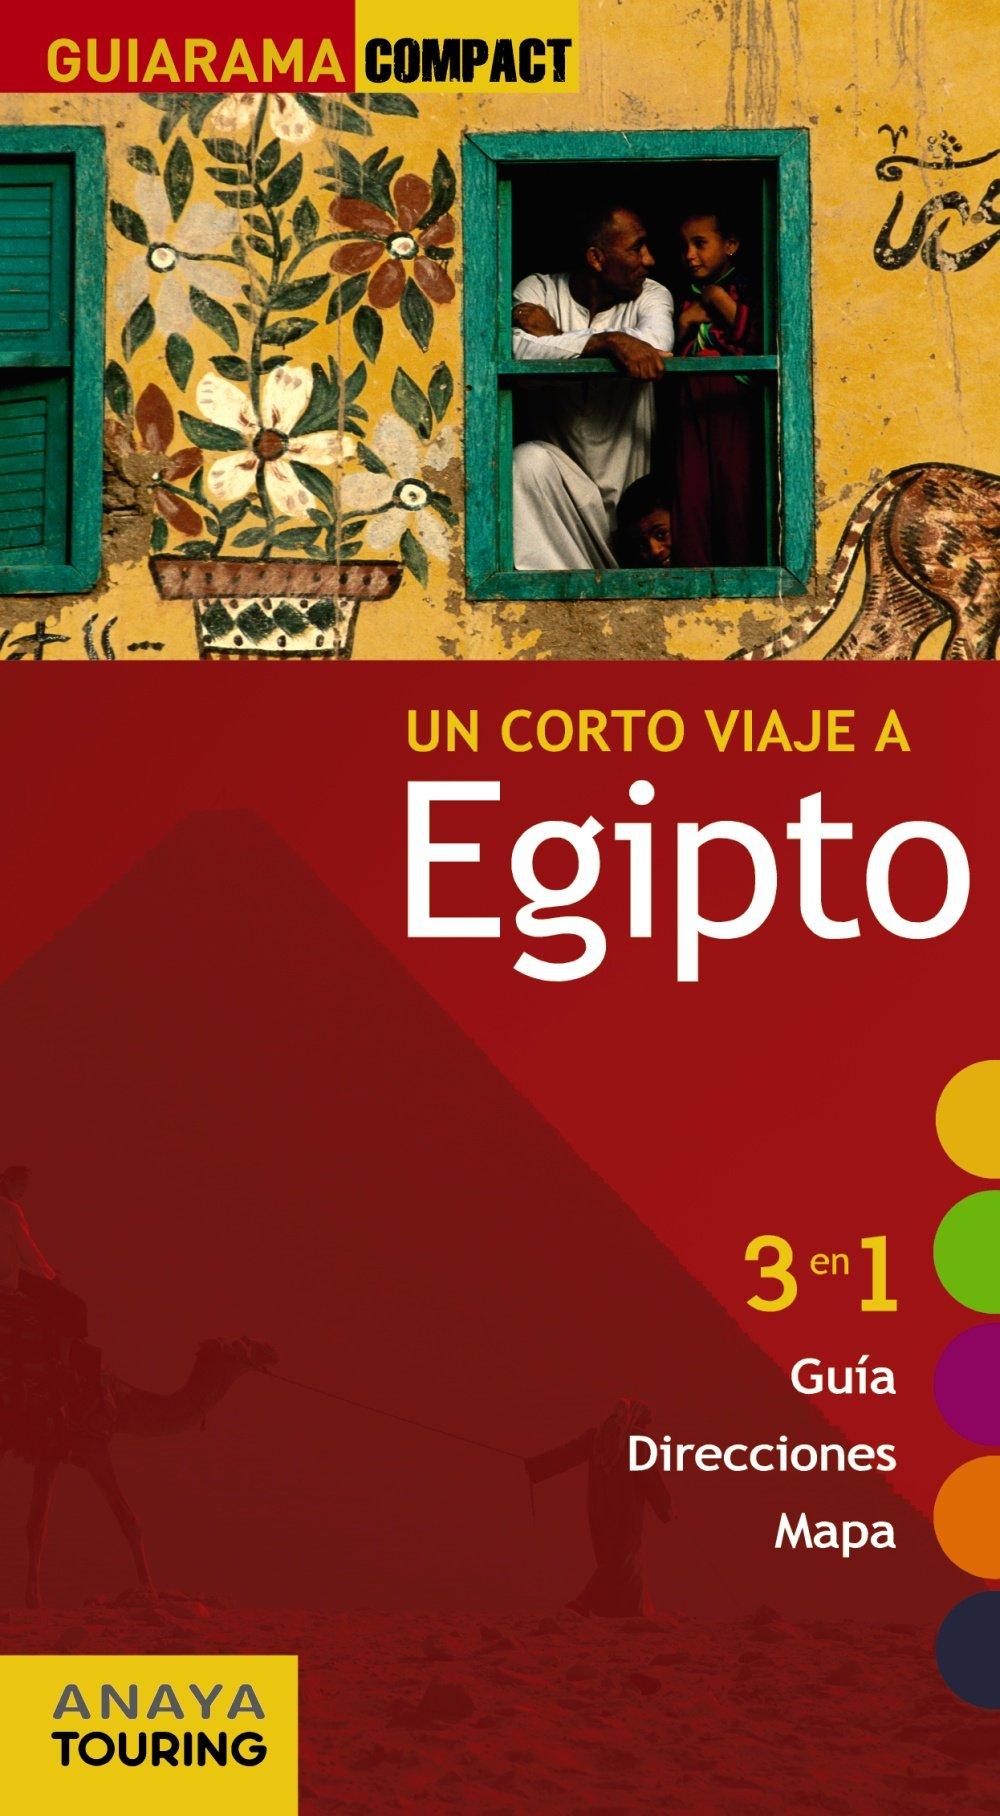 Egipto (Guiarama Compact - Internacional) Tapa blanda – 28 feb 2011 Anaya Touring Roger Mimó 8497765982 Egypt